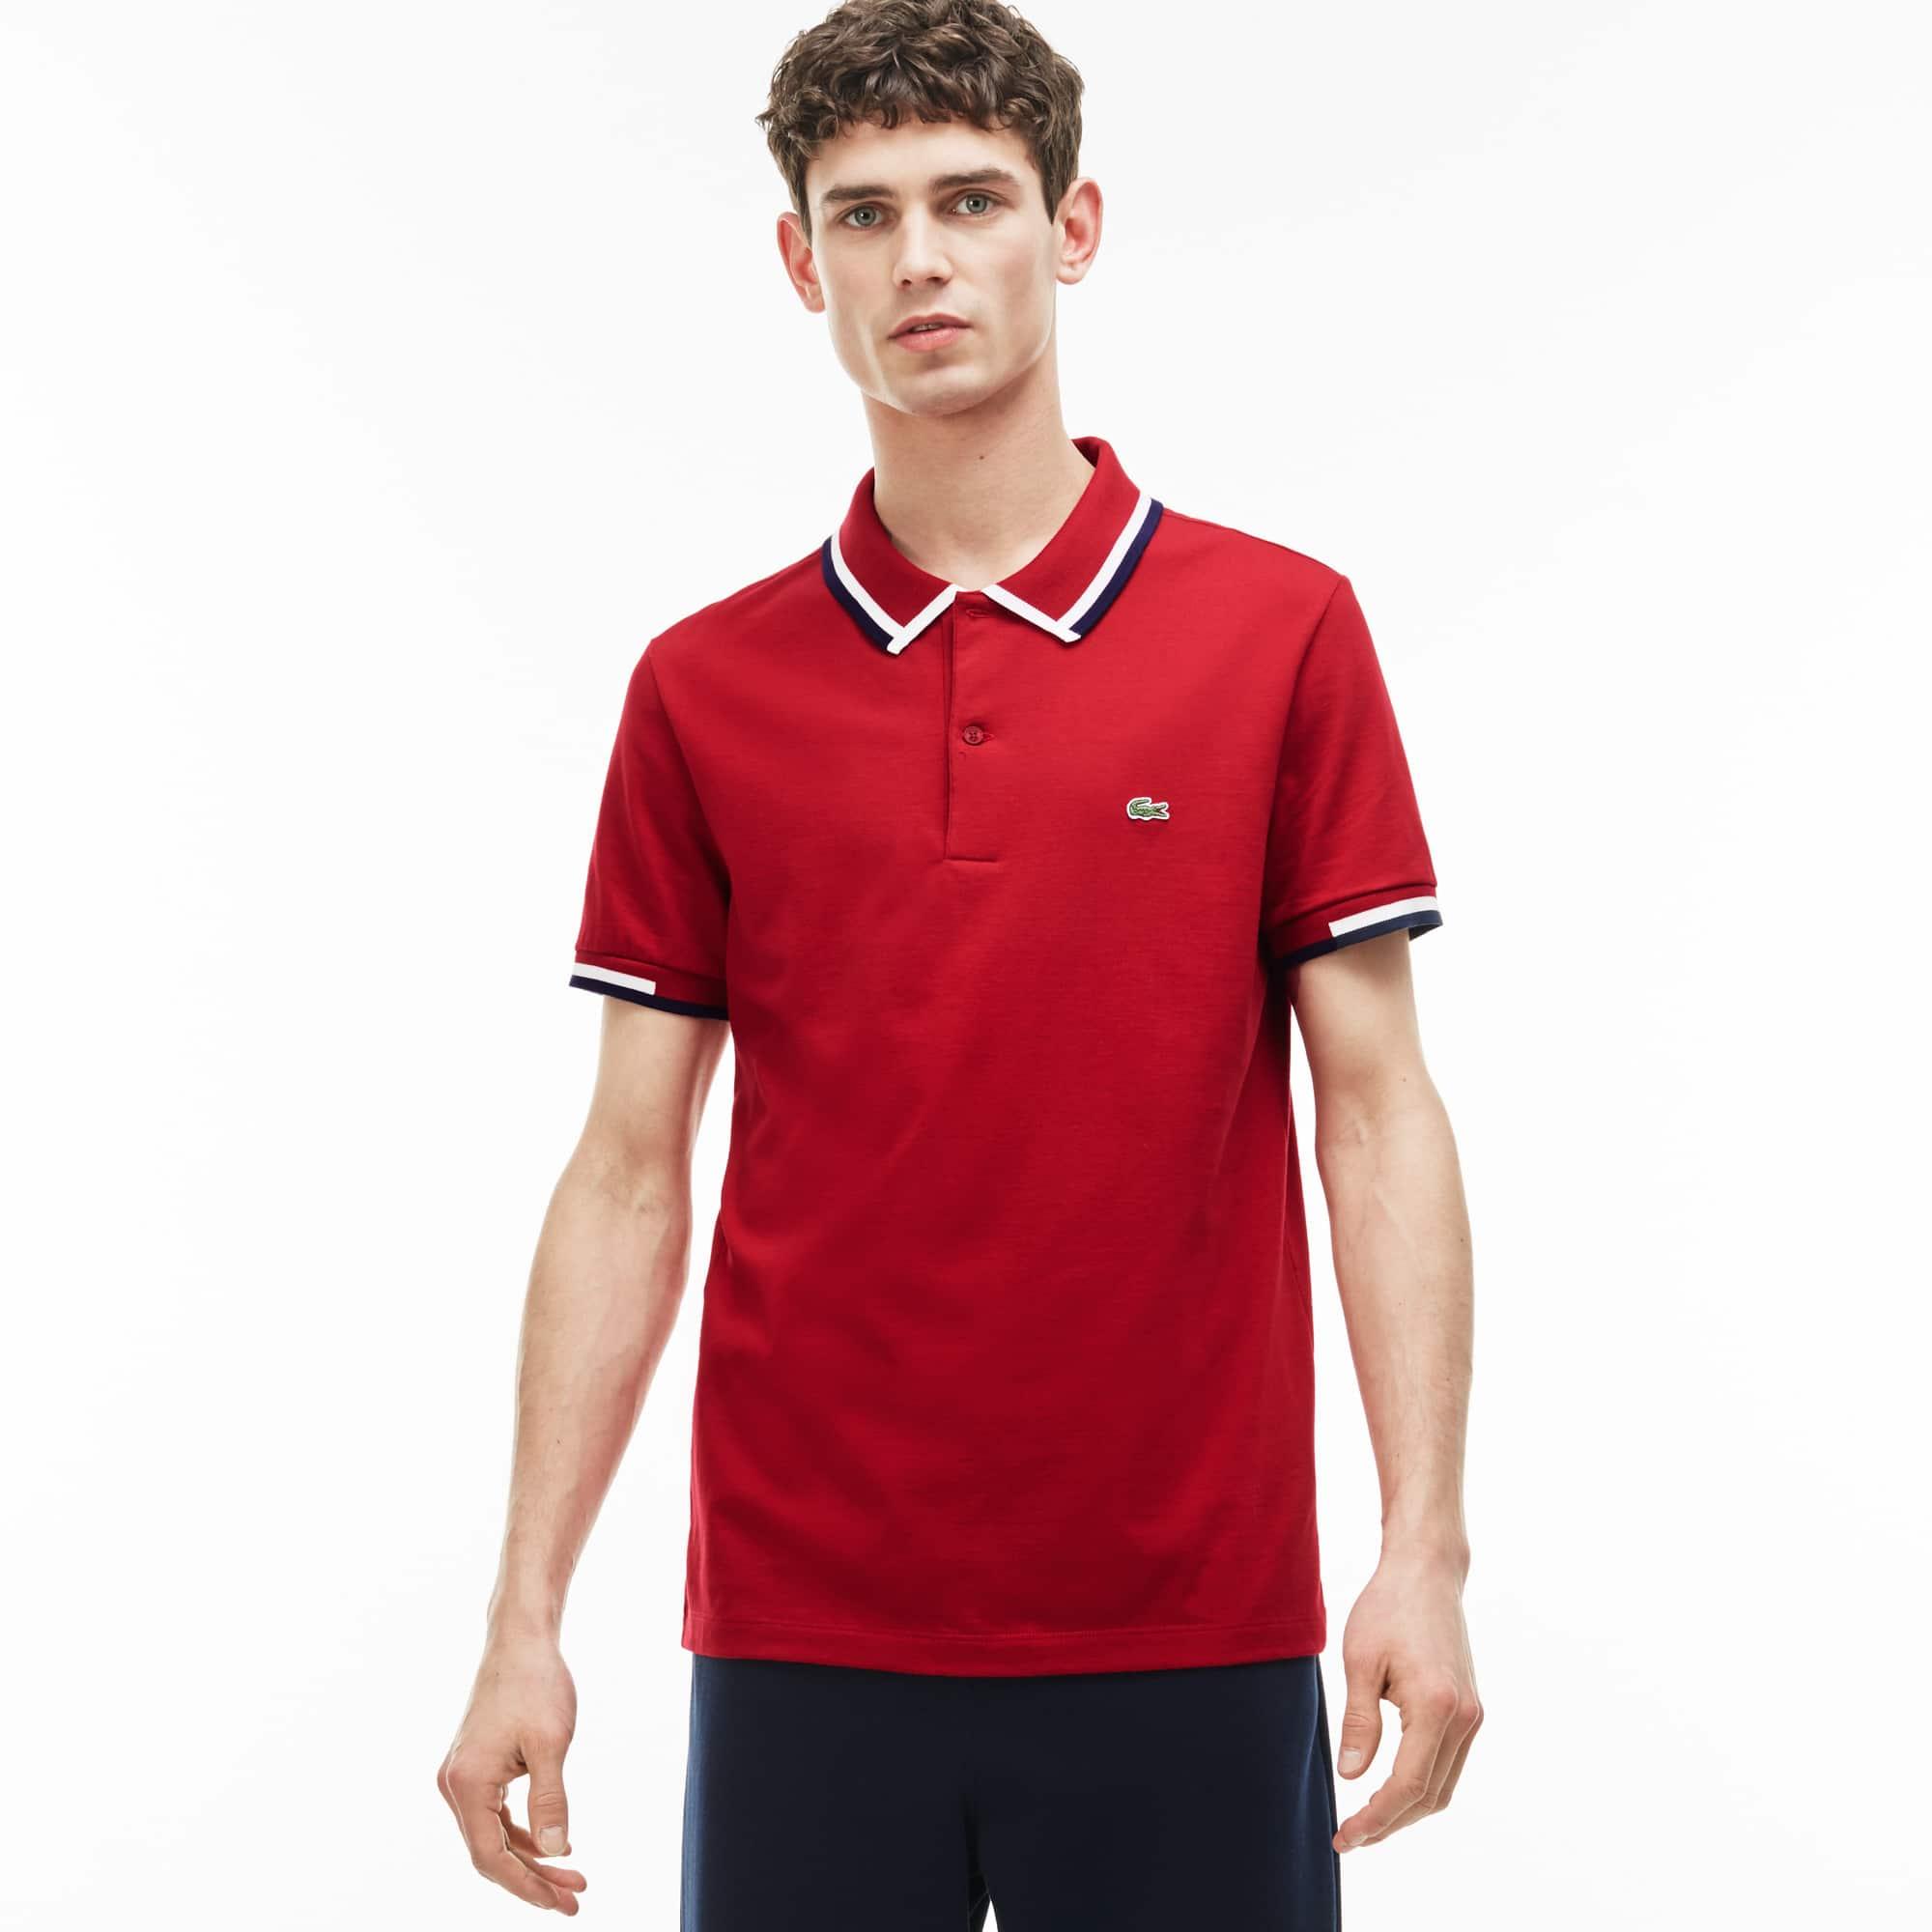 Men's Lacoste Regular Fit Tricolor Neck Jersey Polo